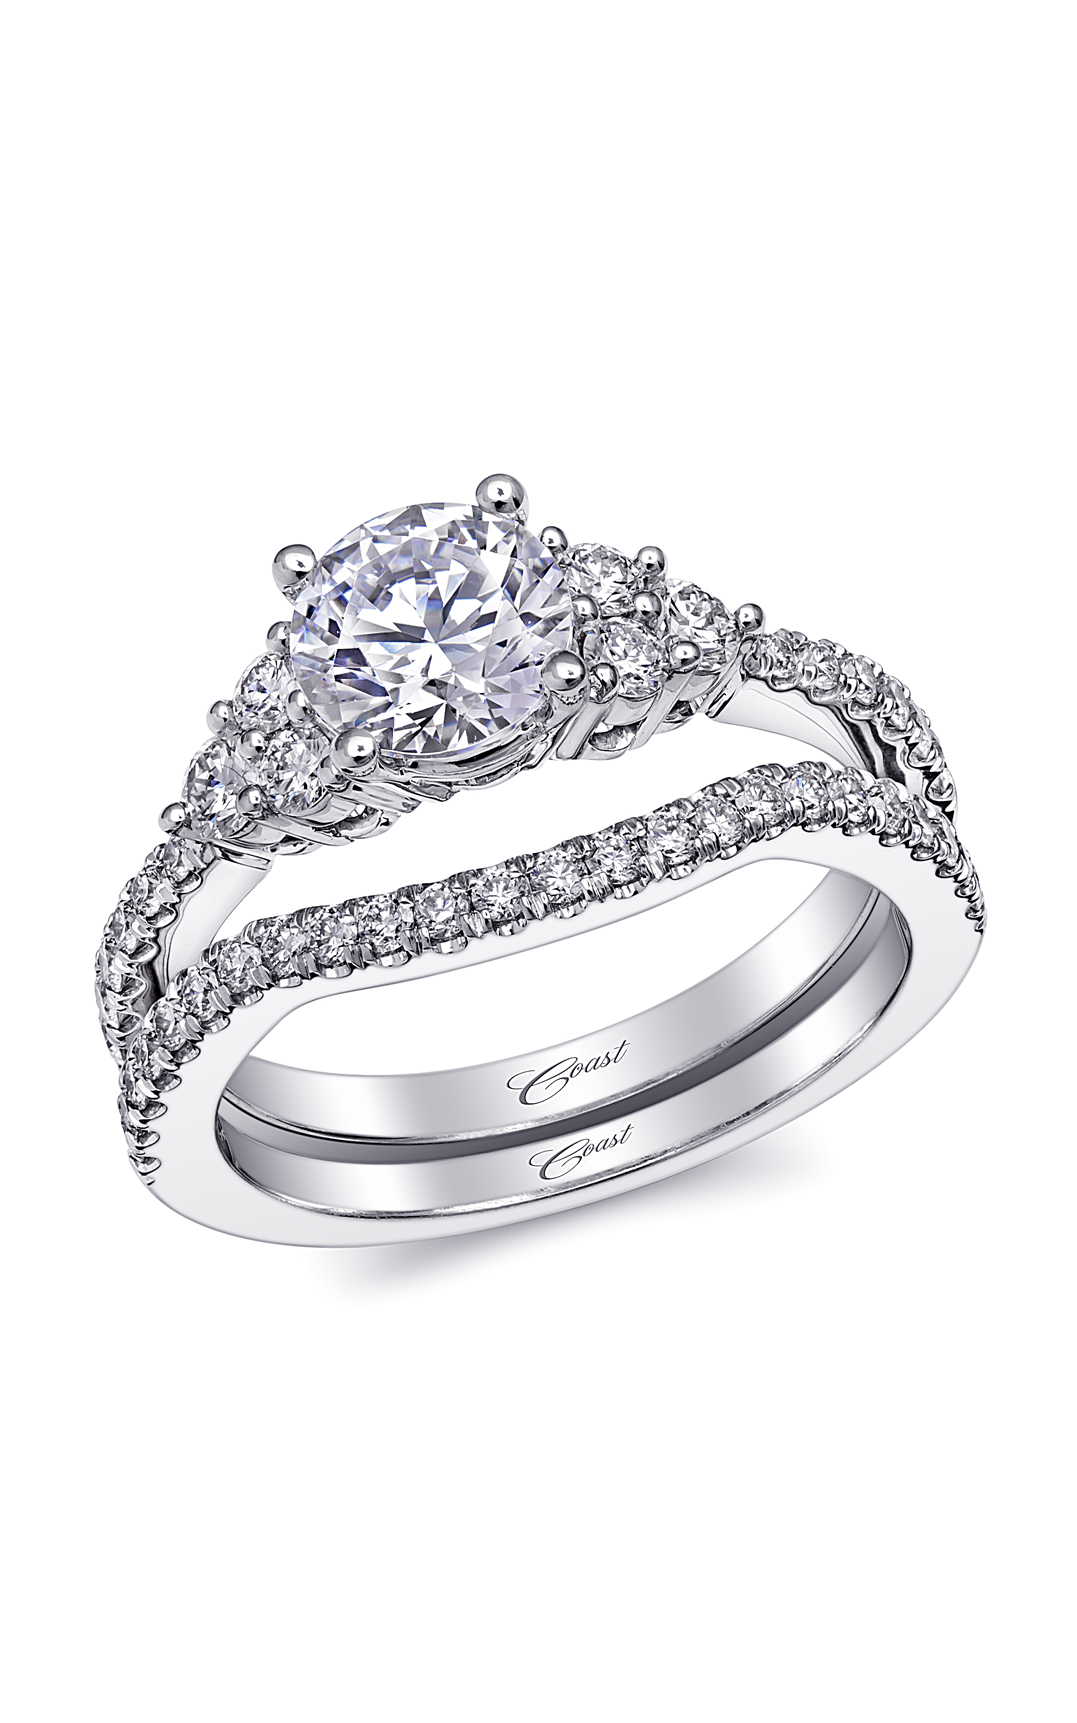 Coast Diamond Charisma LC6029 product image